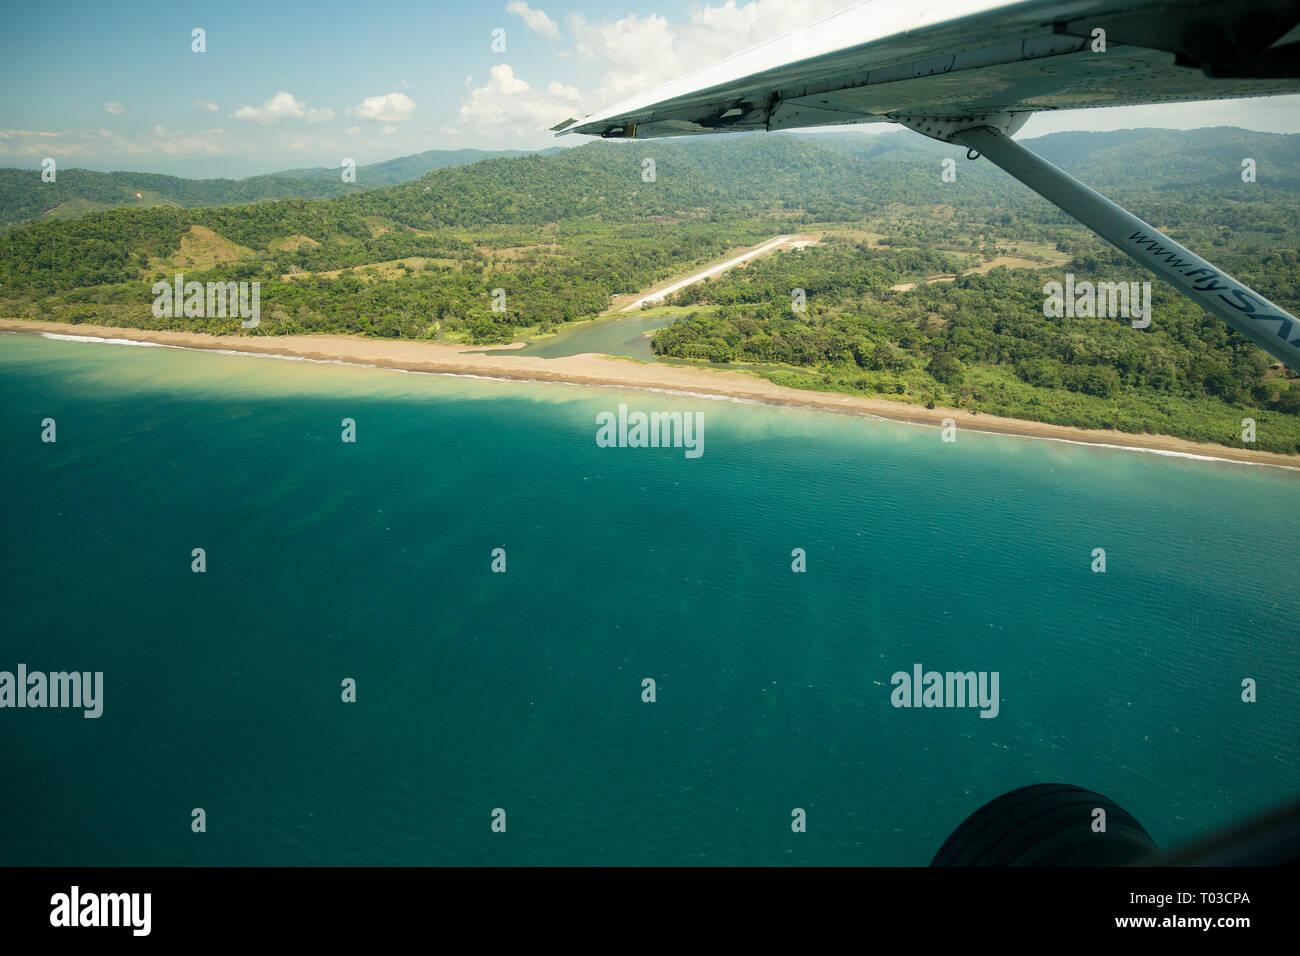 Costa Rica airport air strip Drake Bay Osa Peninsula. - Stock Image